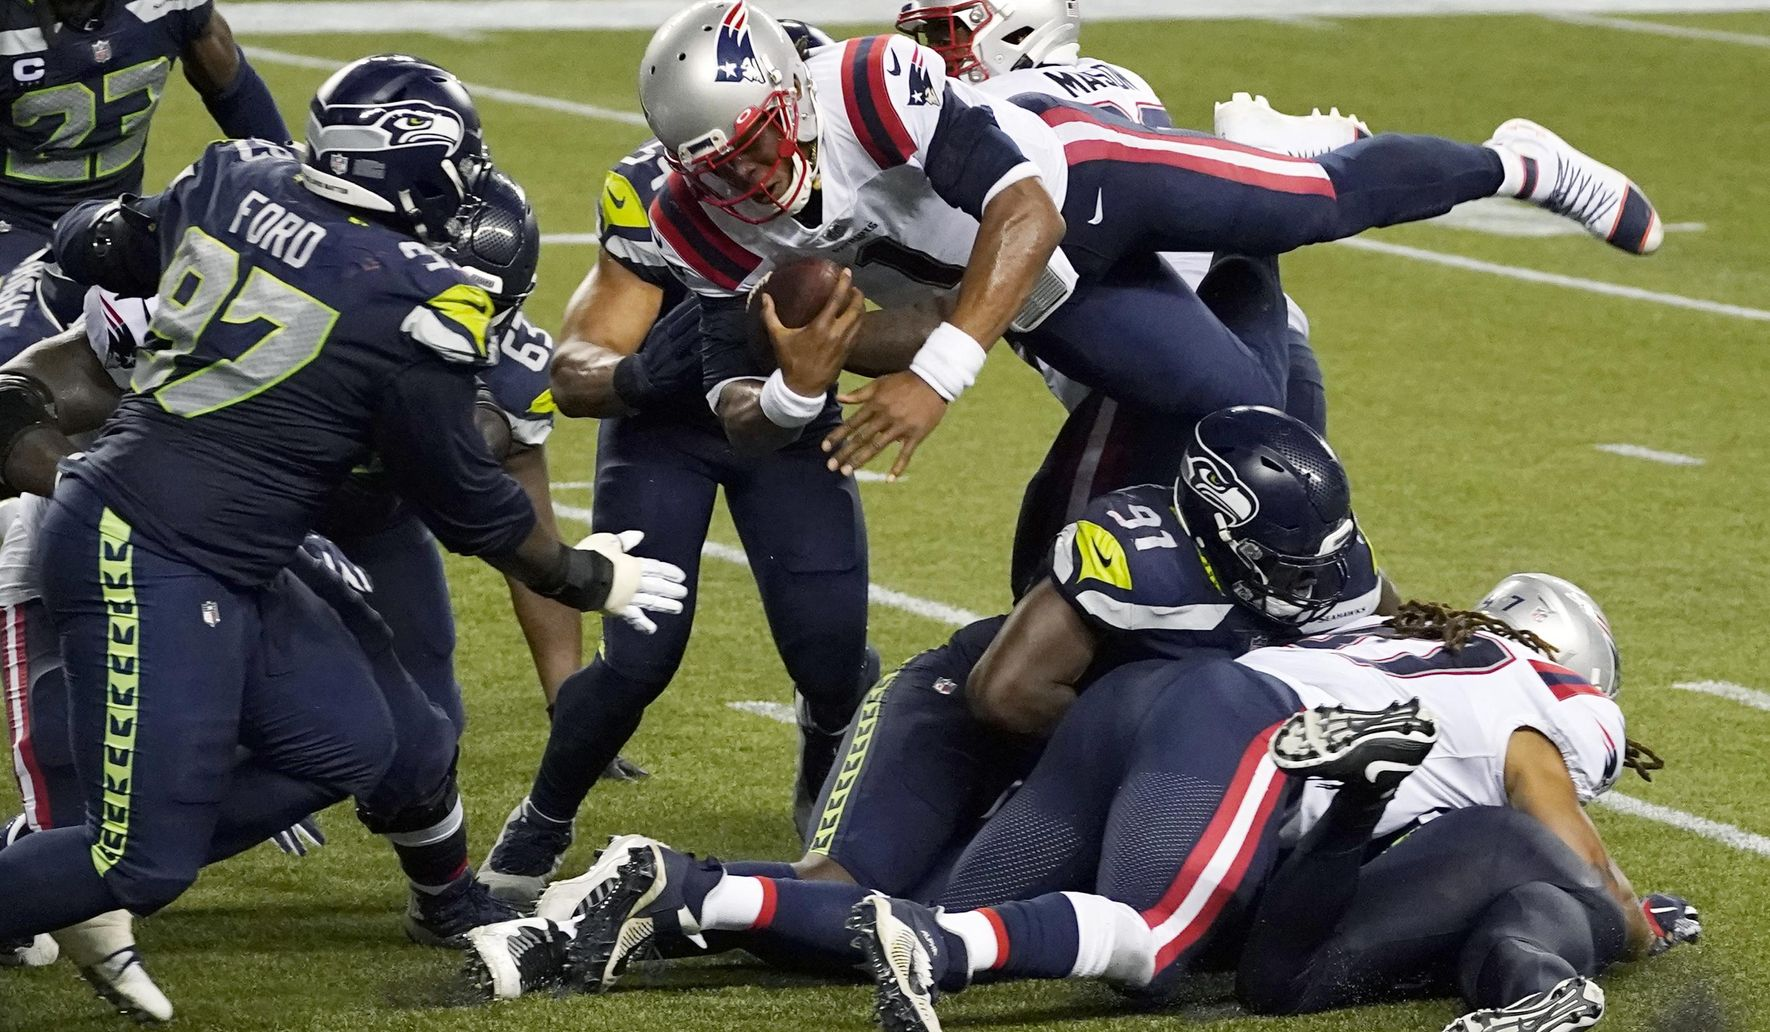 Patriots_seahawks_football_56238_c0-129-3080-1924_s1770x1032